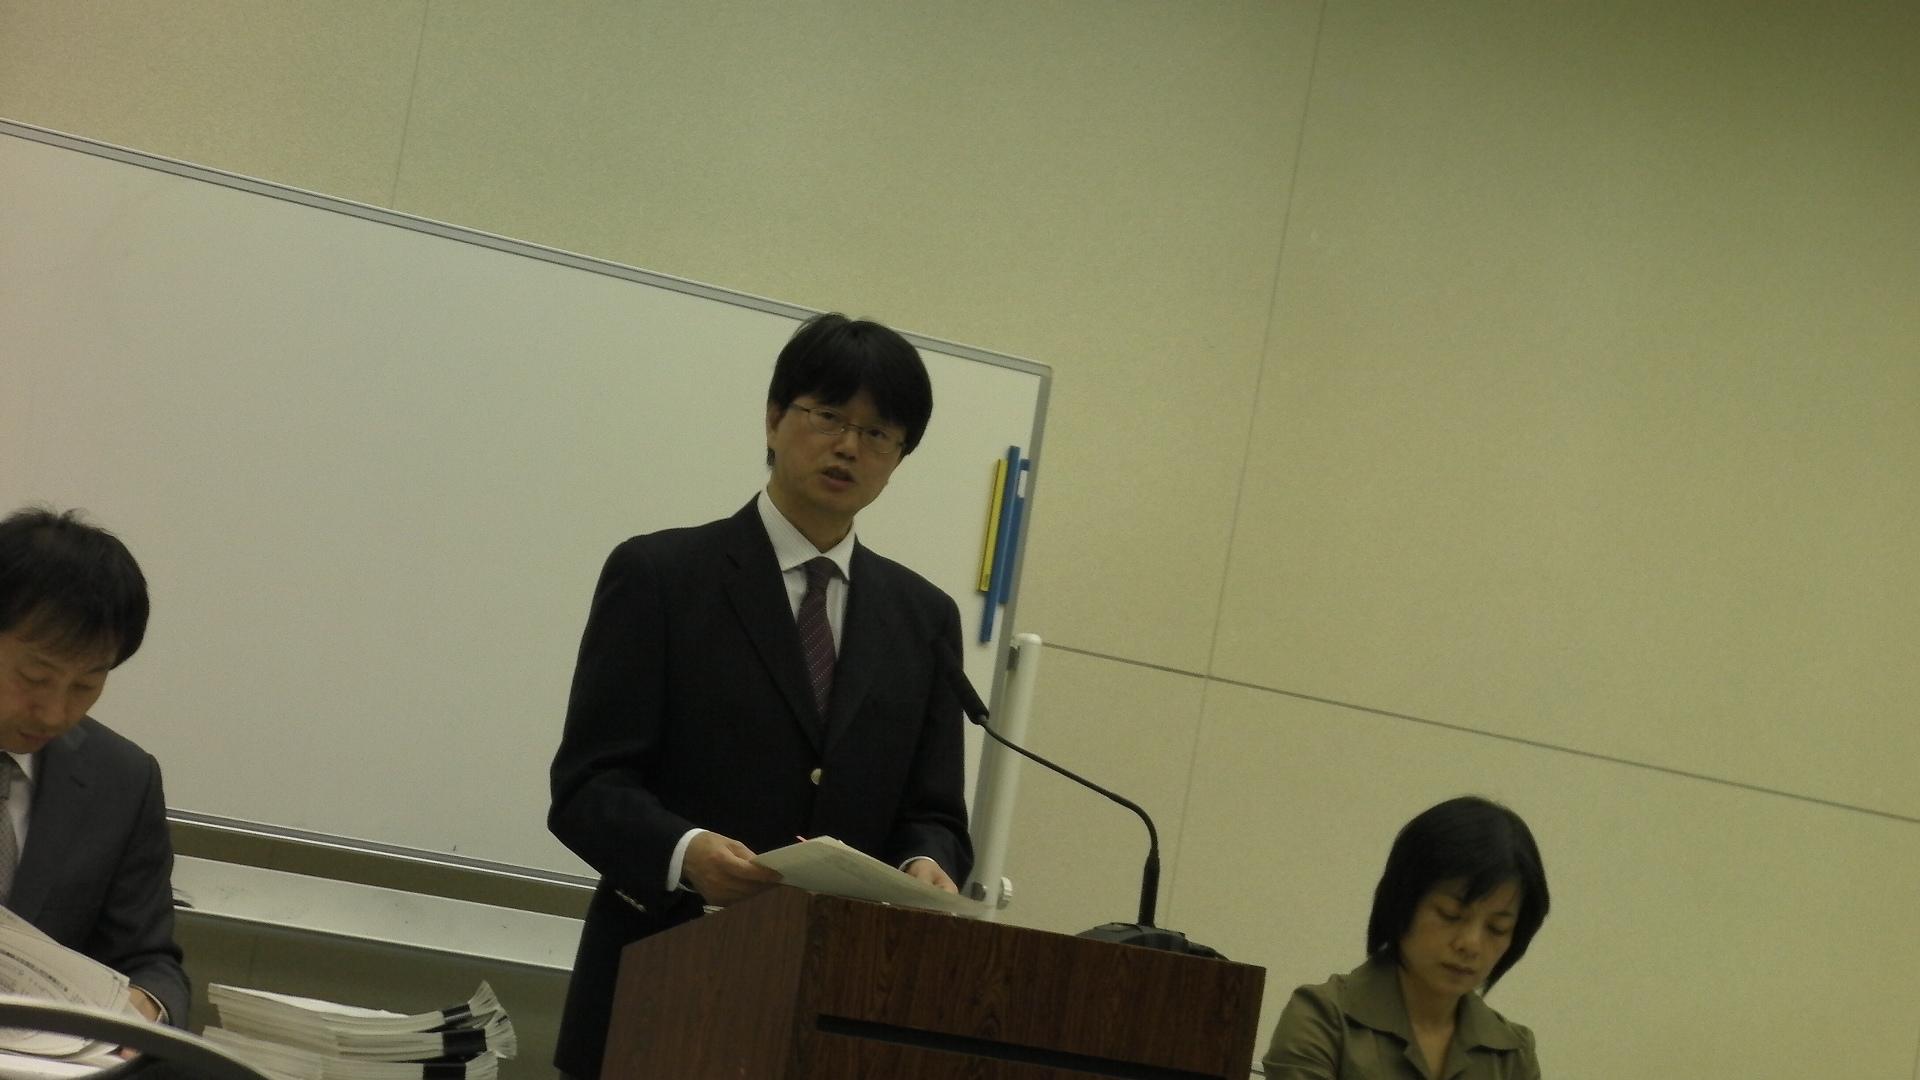 http://daily.magazine9.jp/m9/oshidori/SANY0657.JPG